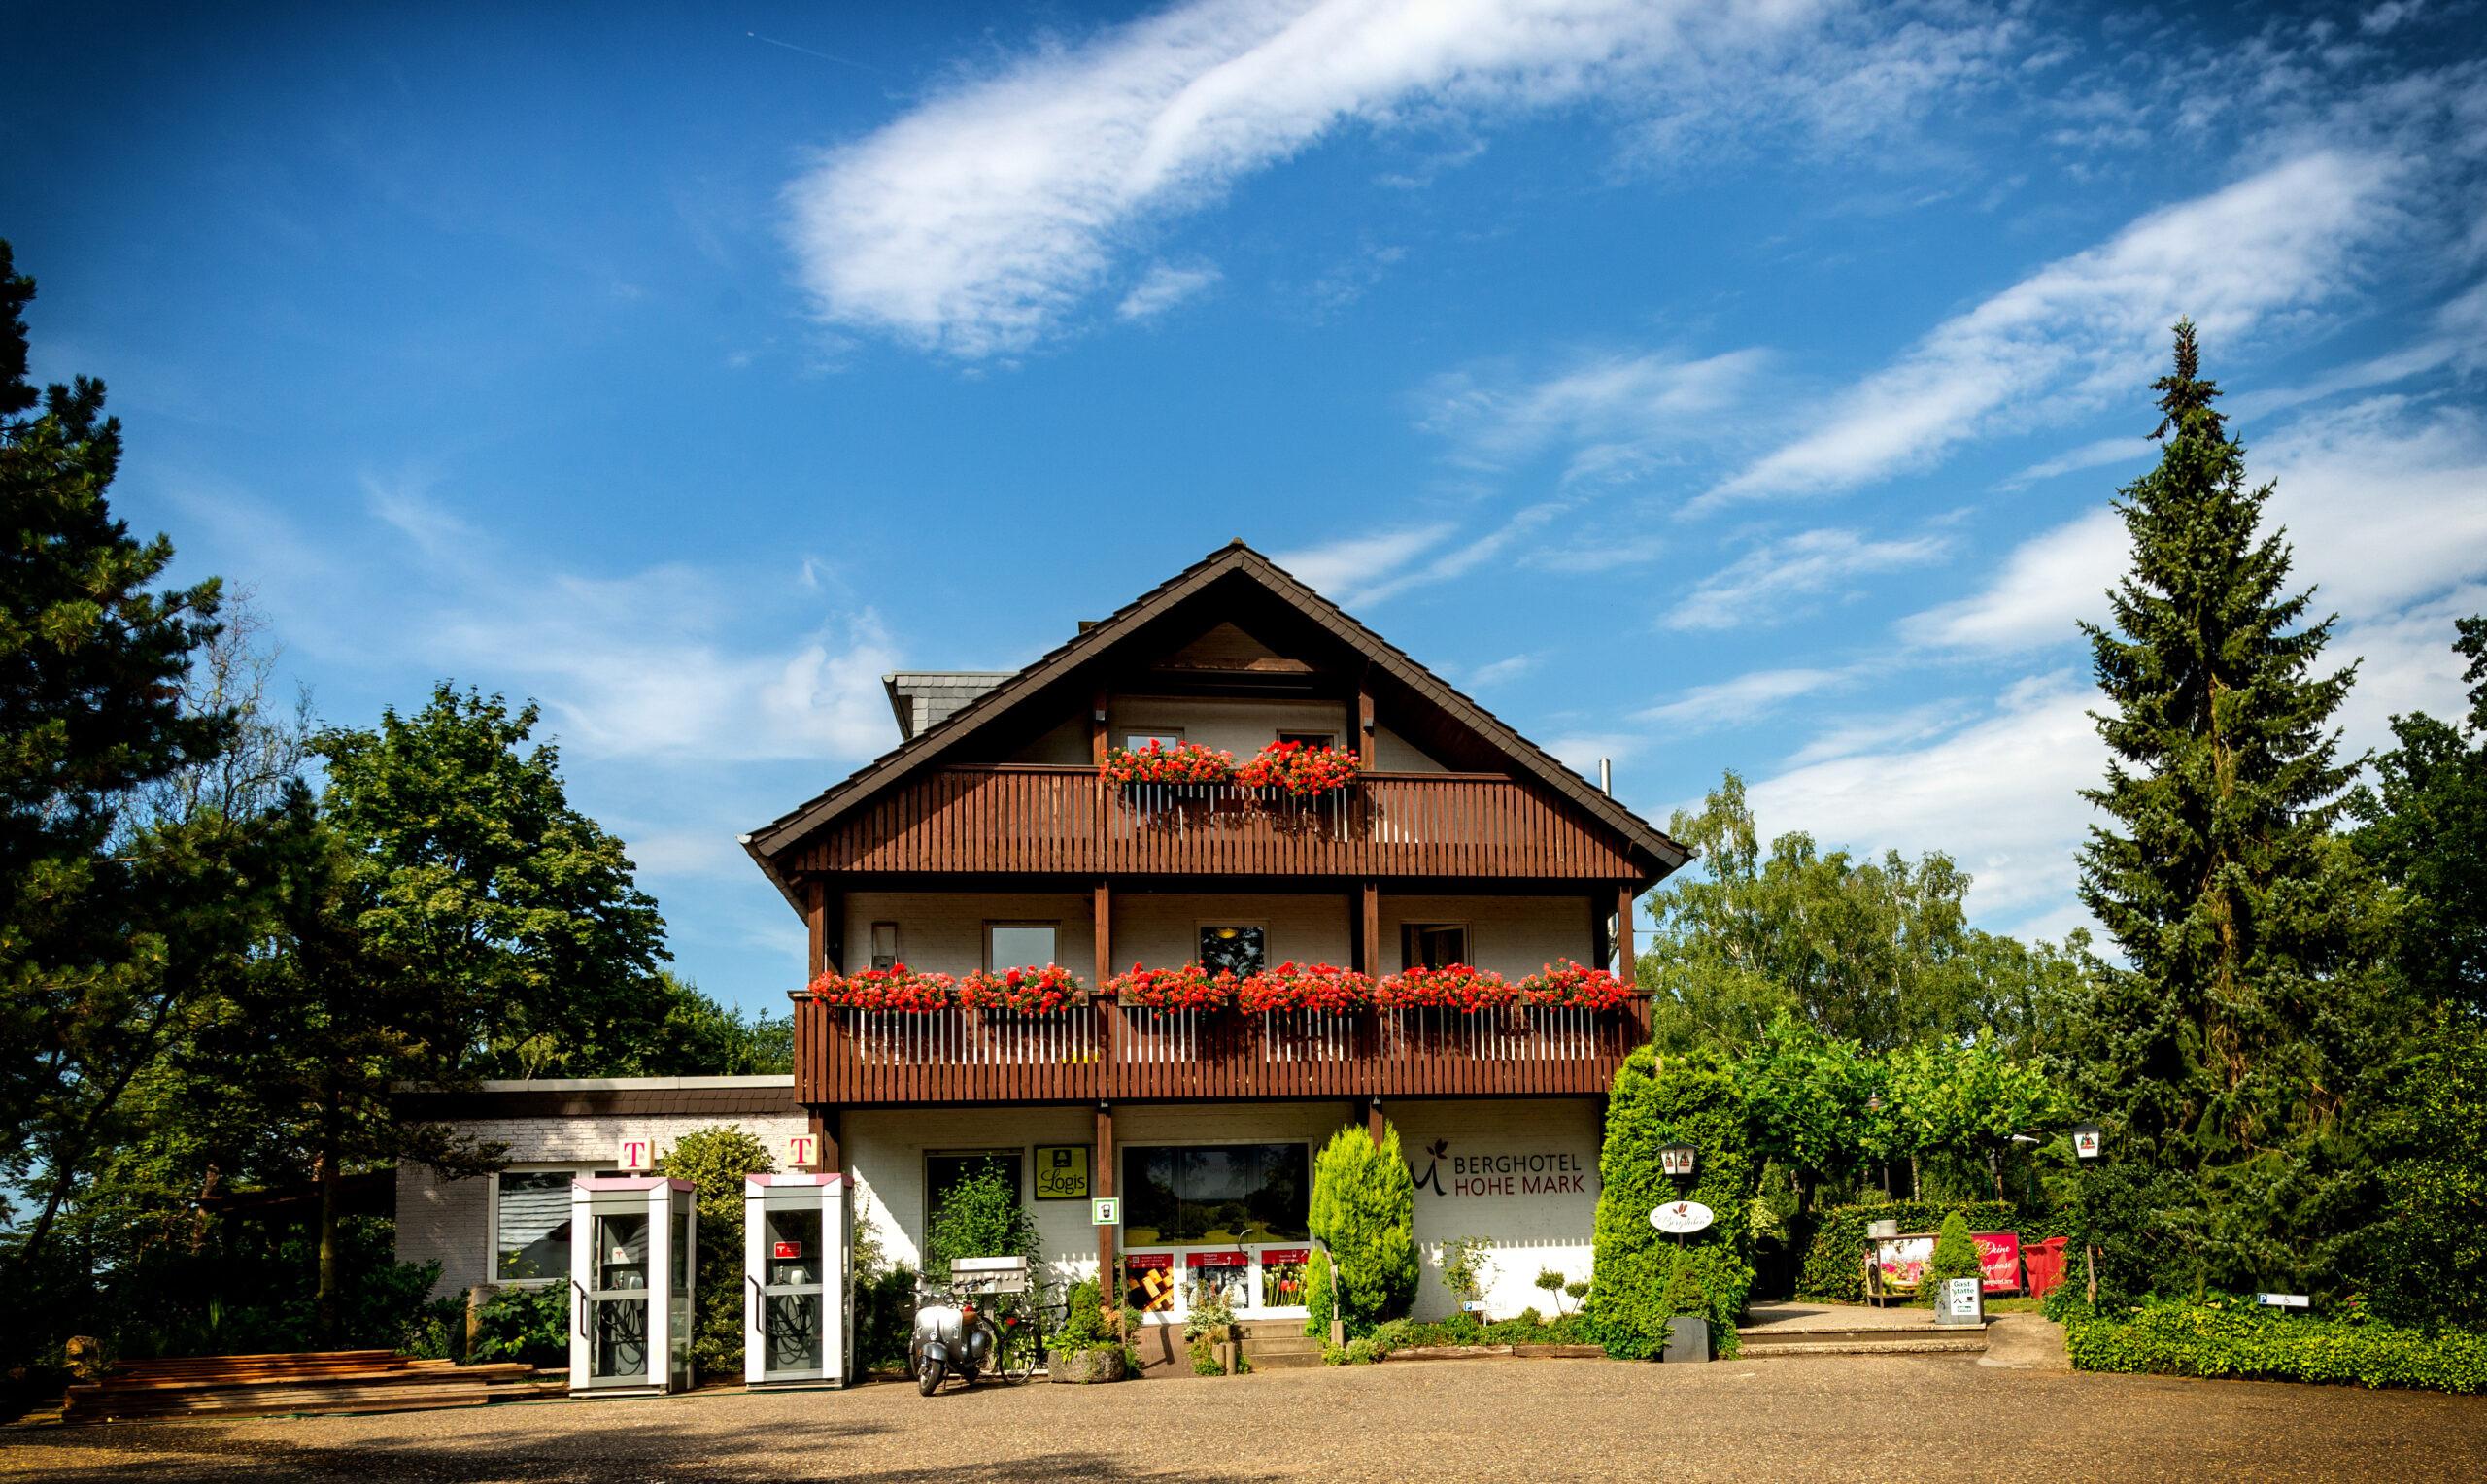 Berghotel Hohe Mark